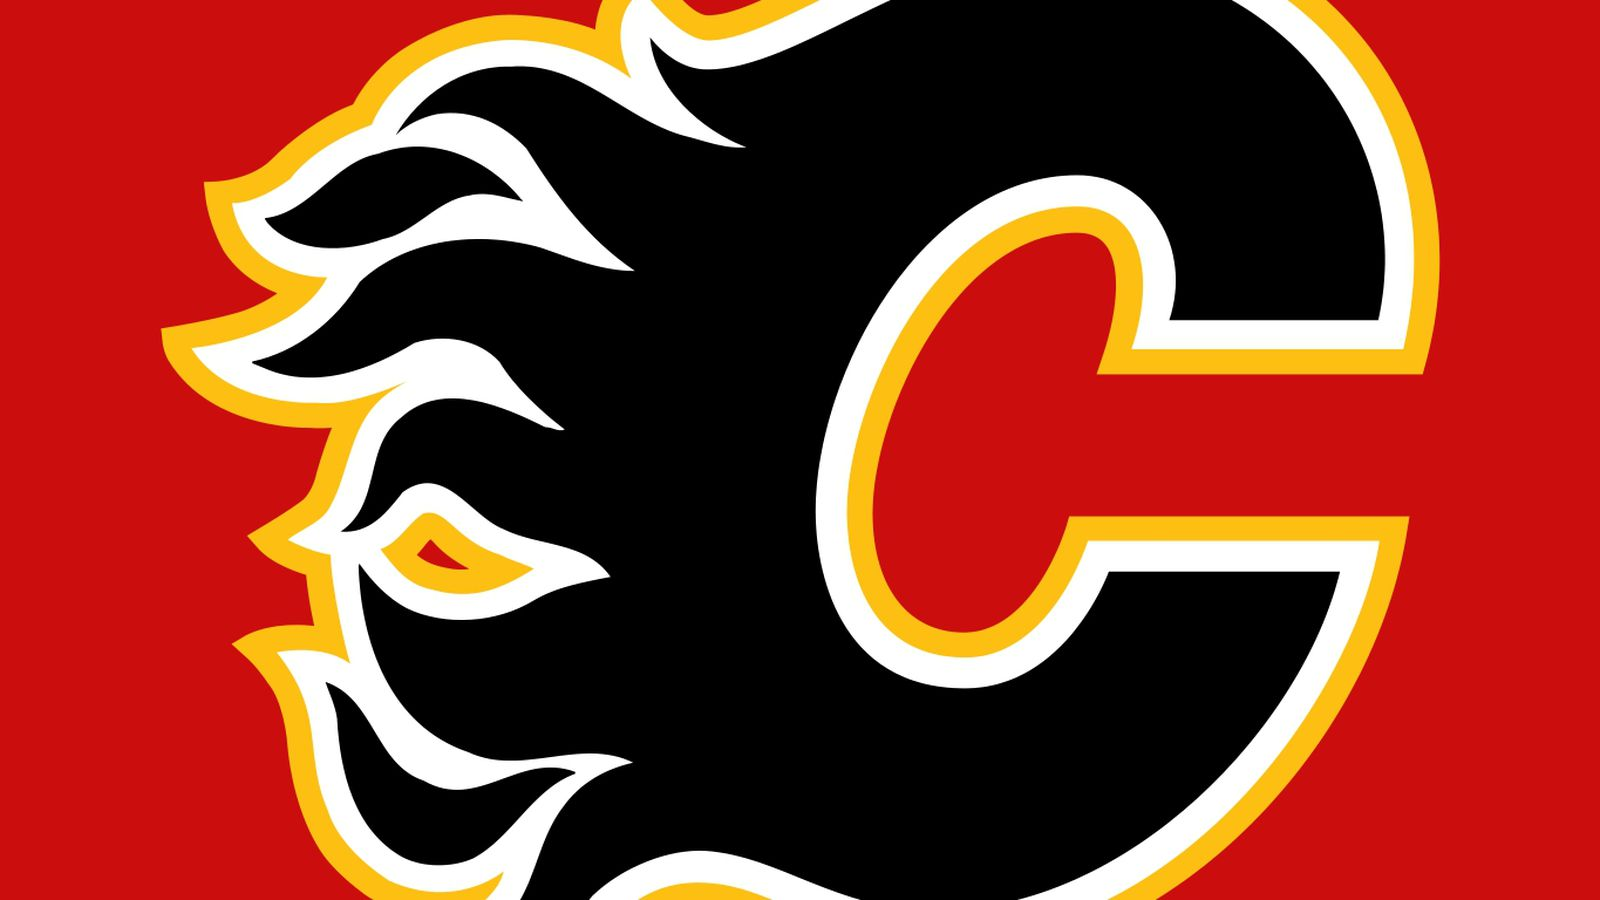 Calgary_flames3.0